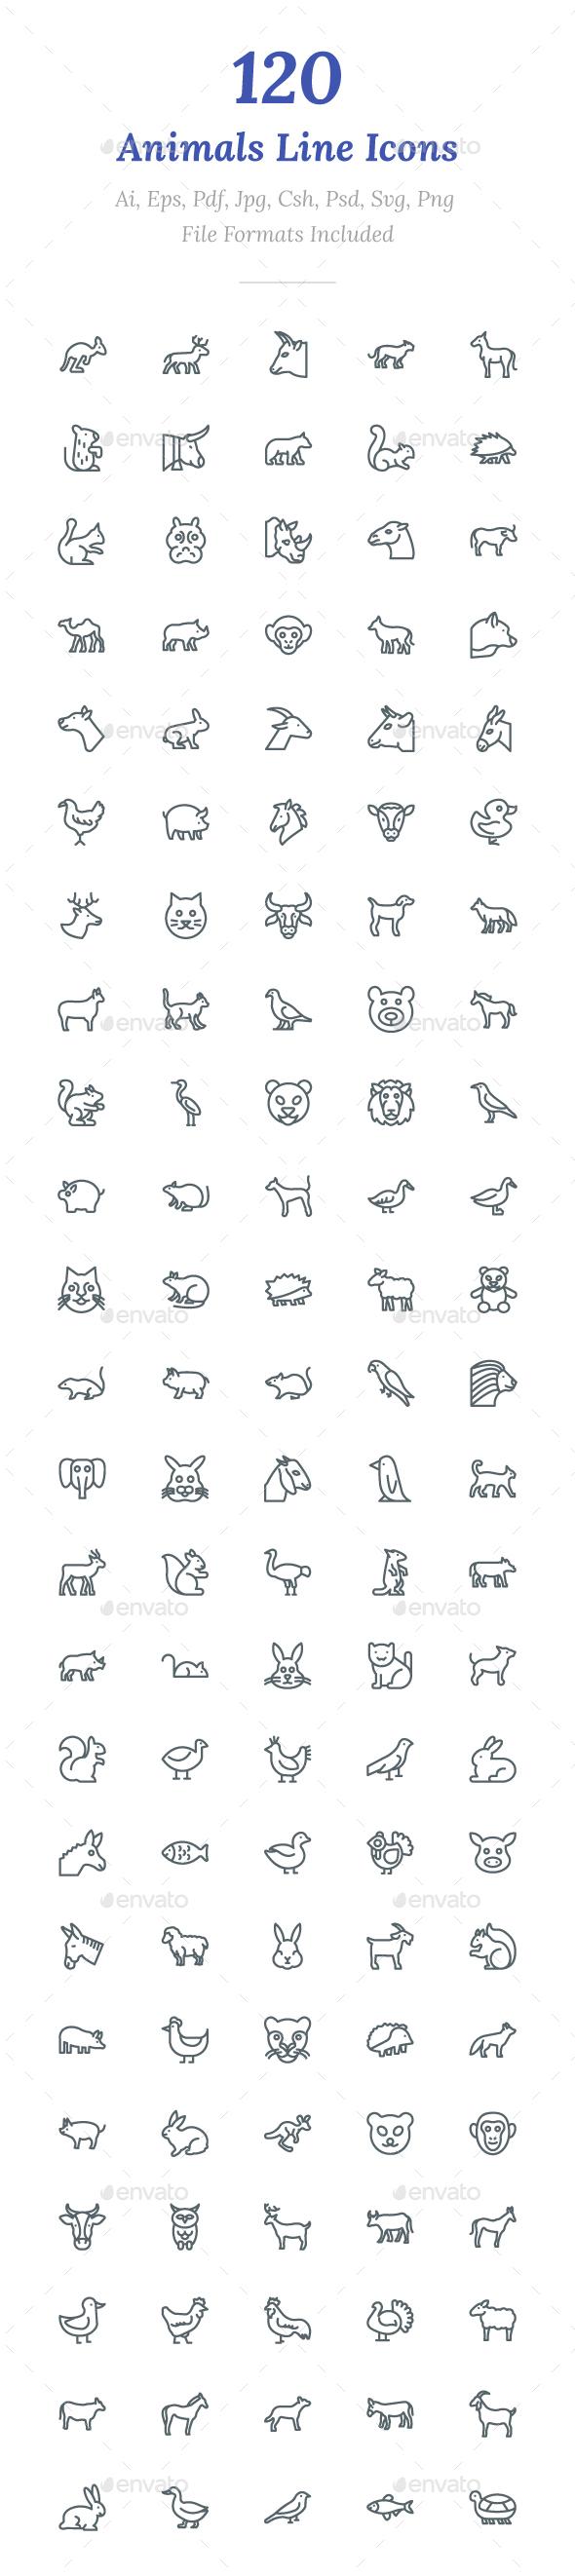 GraphicRiver 120 Animals Line Icons 20704047